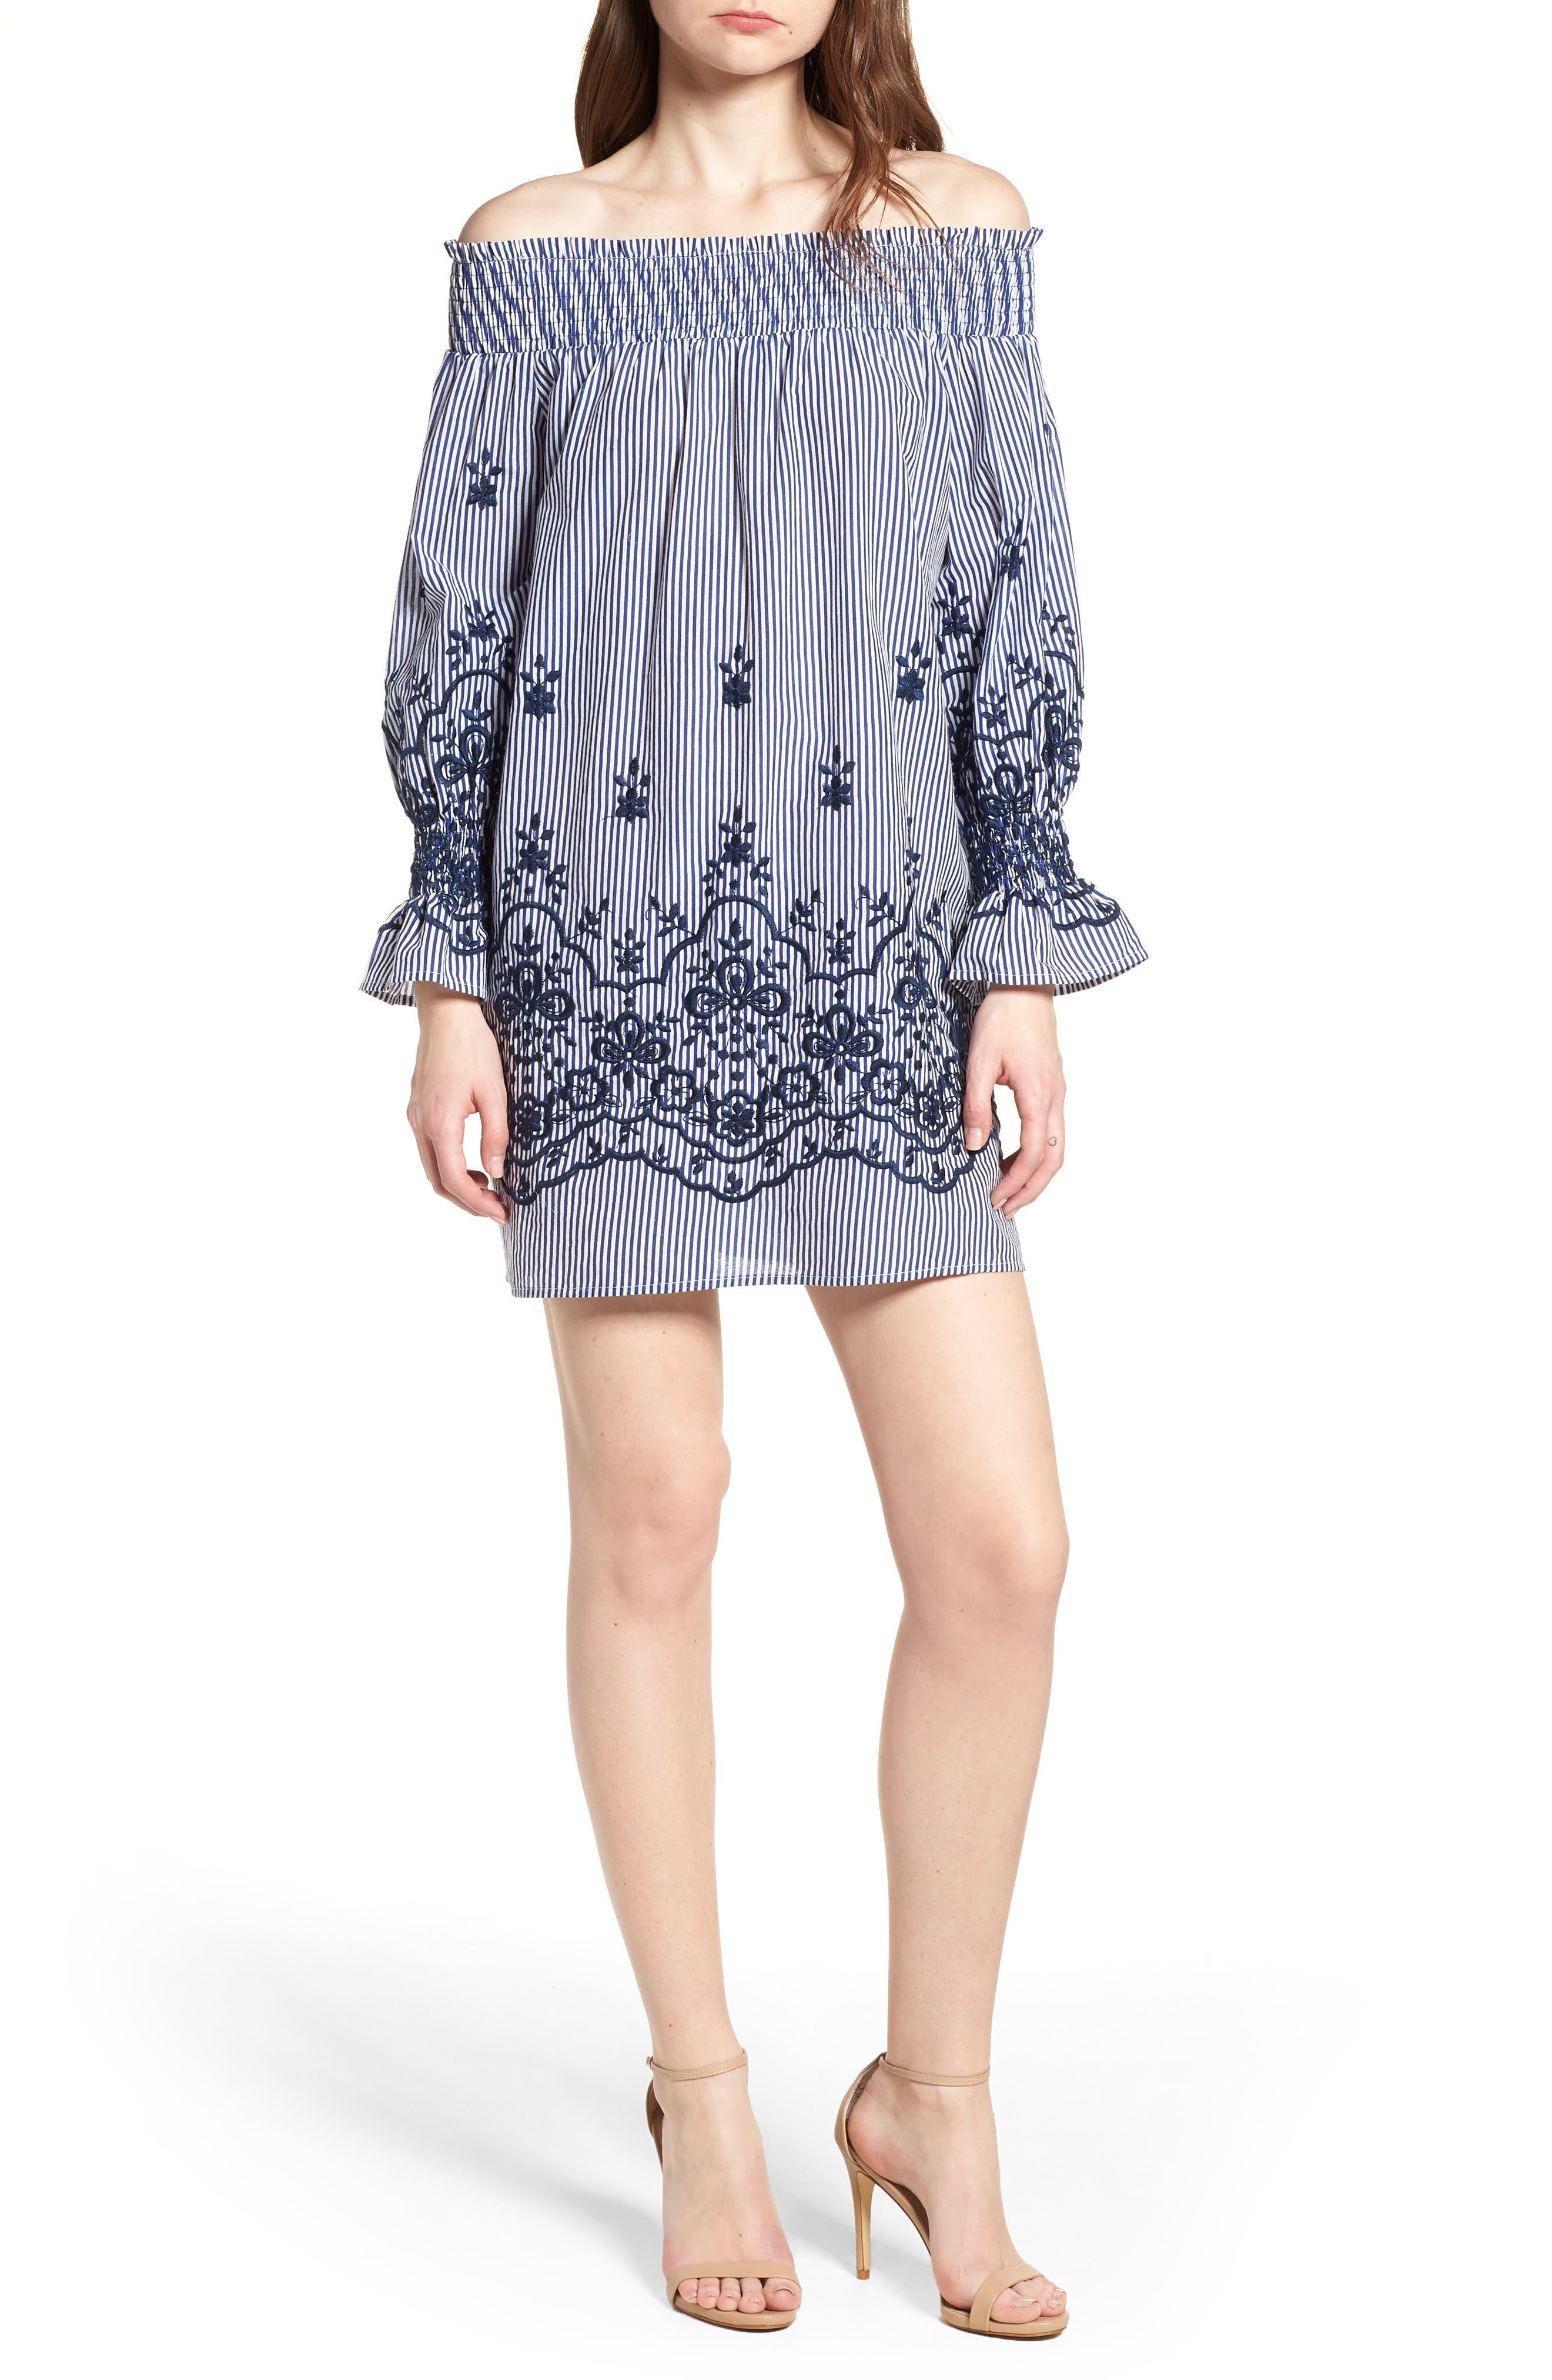 Bishop + Young Stripe Embroidered Off the Shoulder Dress,                         Main,                         color,